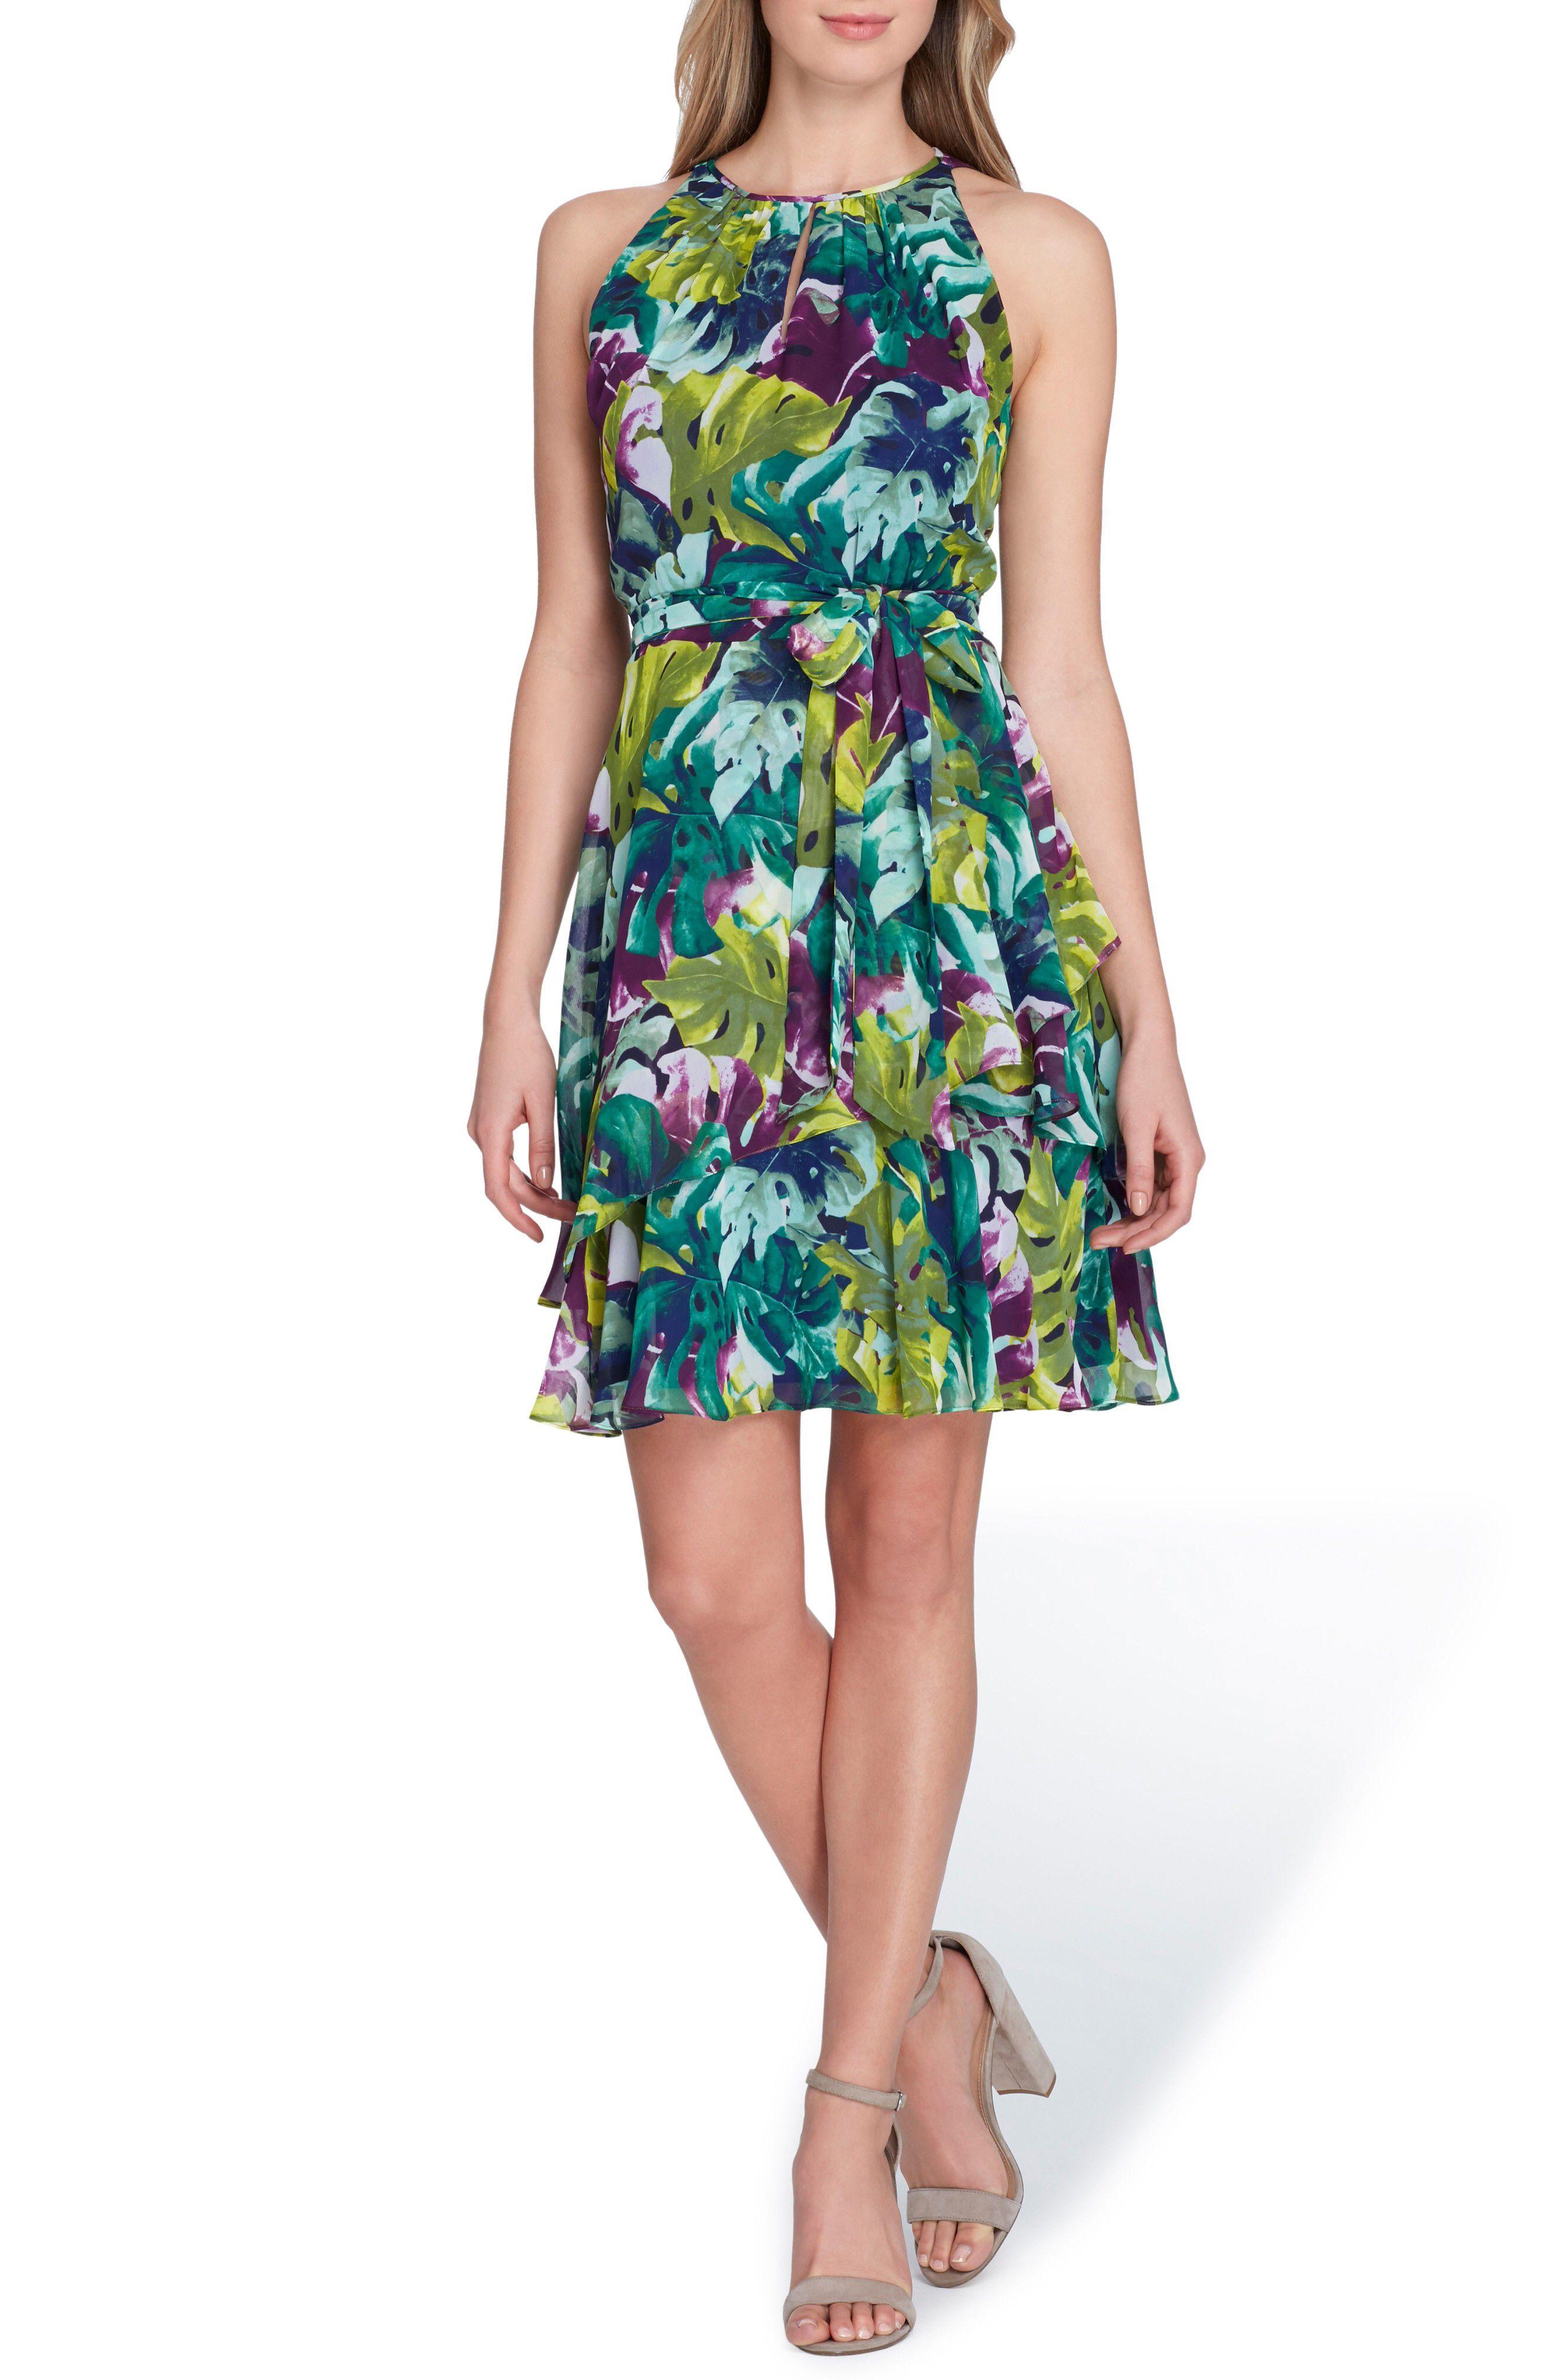 271599d0b00 Tahari Tropical Print Chiffon Dress available at  Nordstrom ...